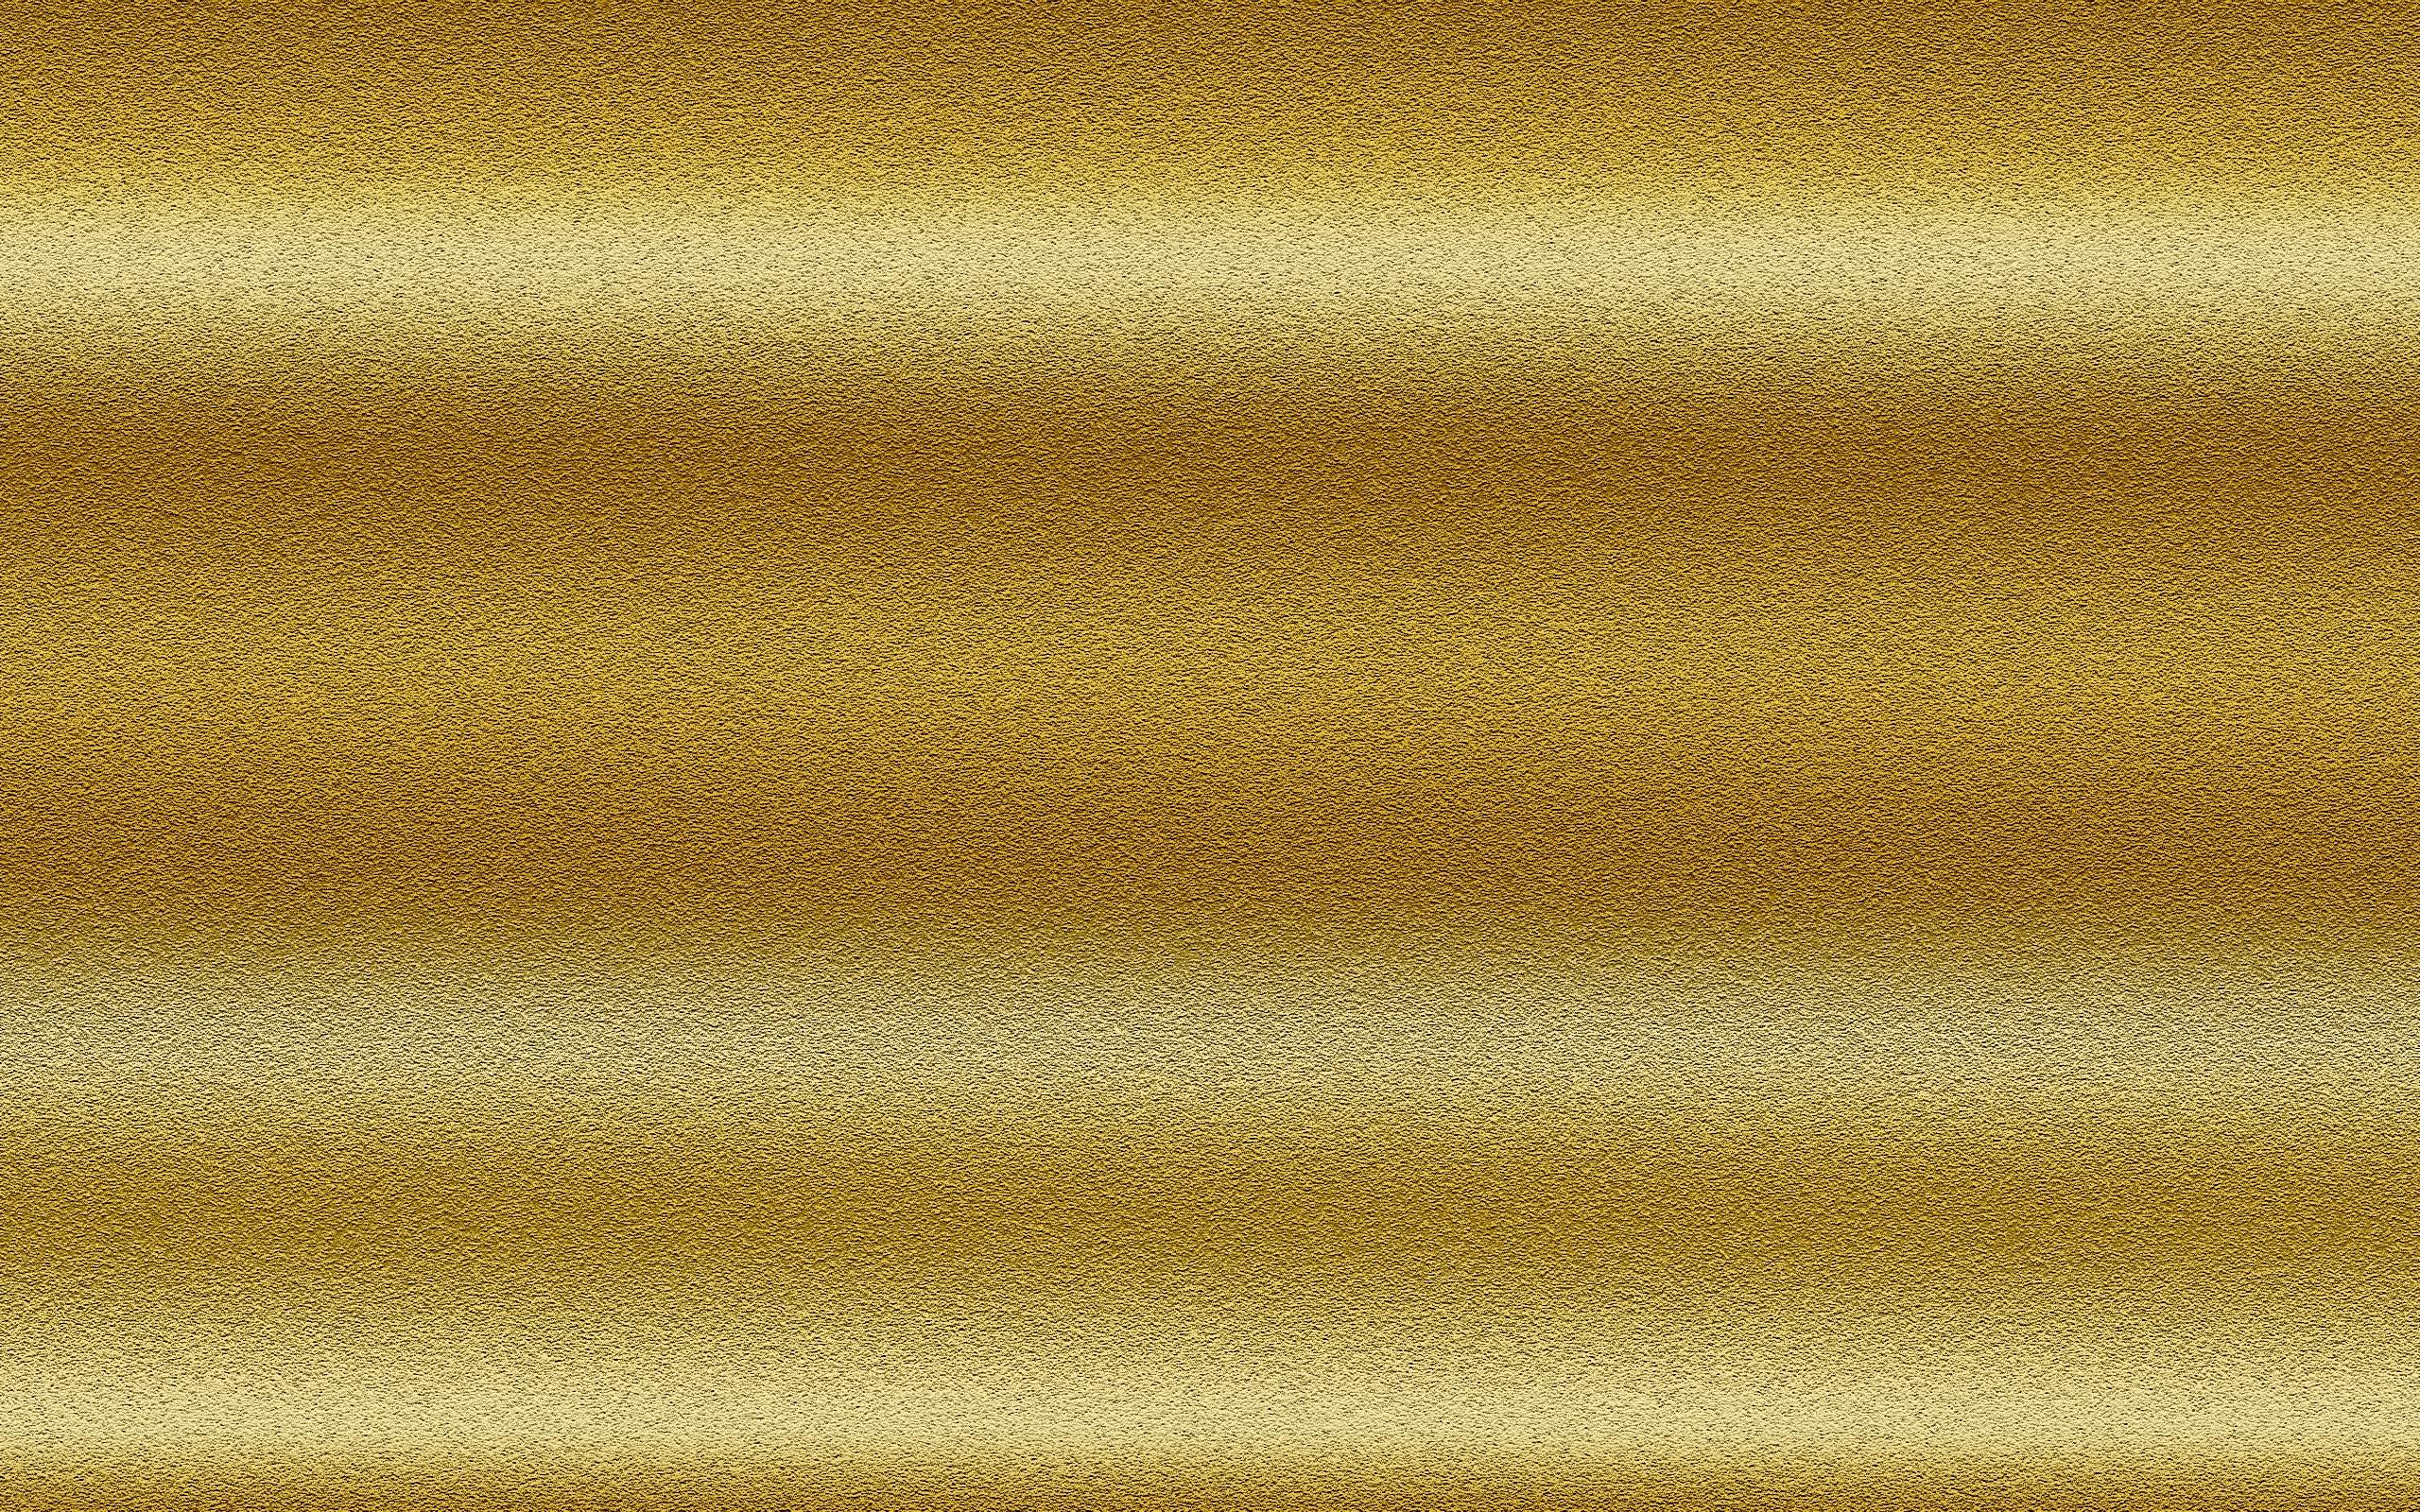 gold wallpaper background 49495